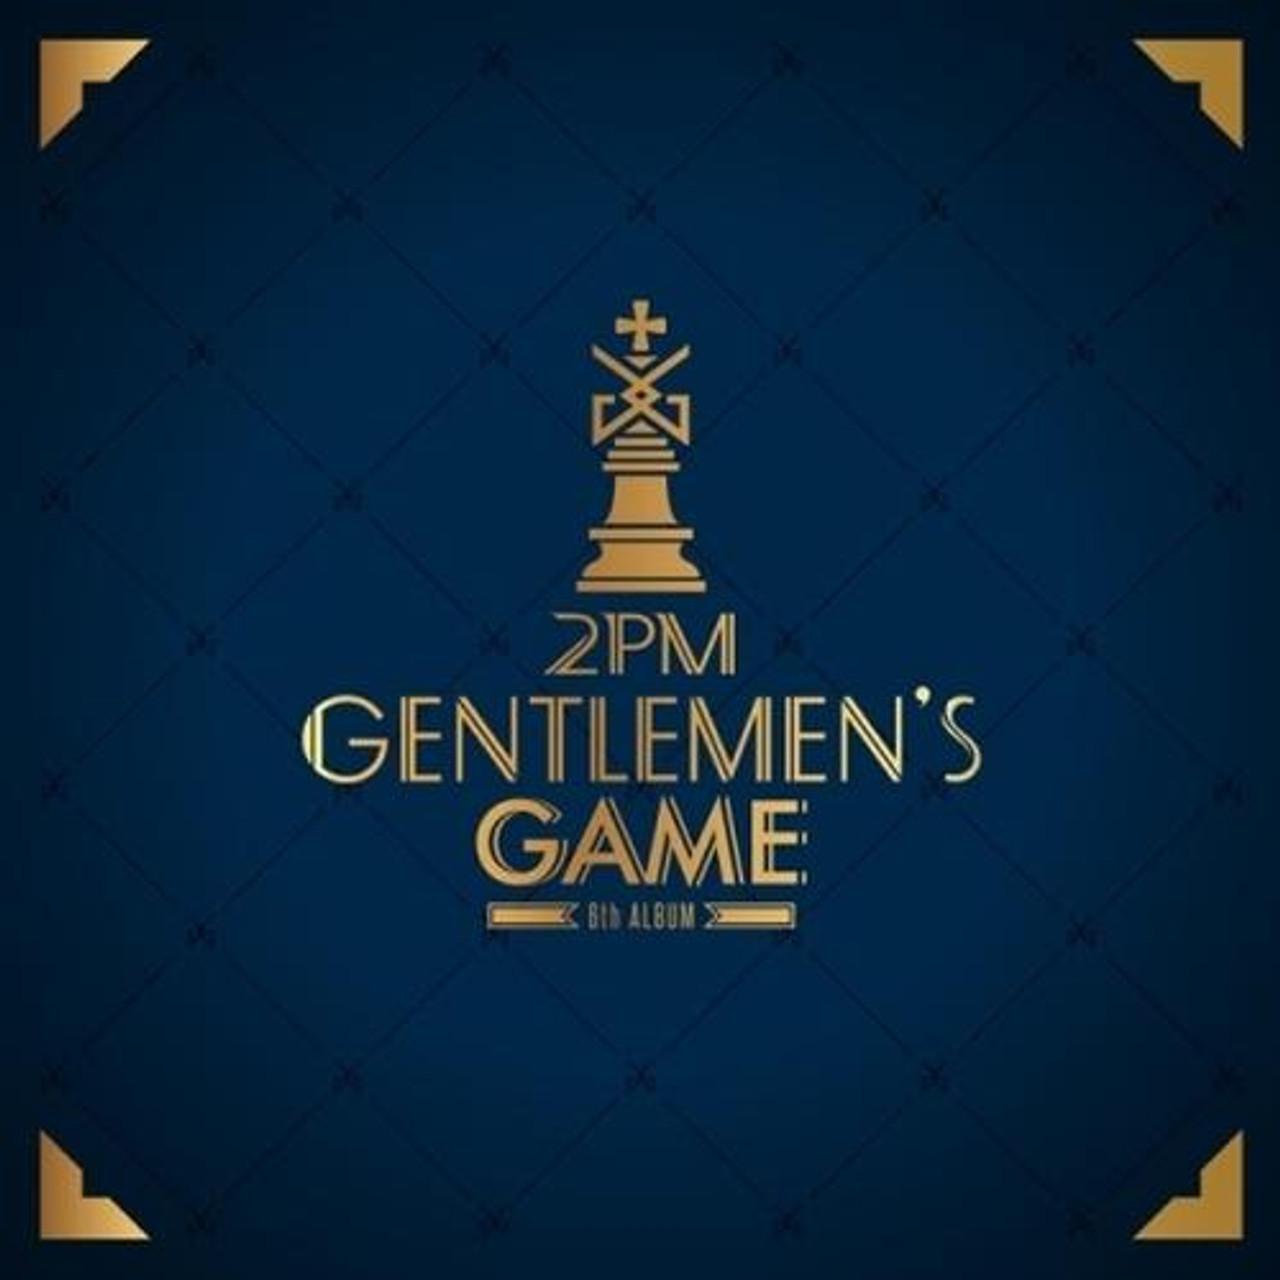 2PM - Vol.6 / GENTLEMENS GAME